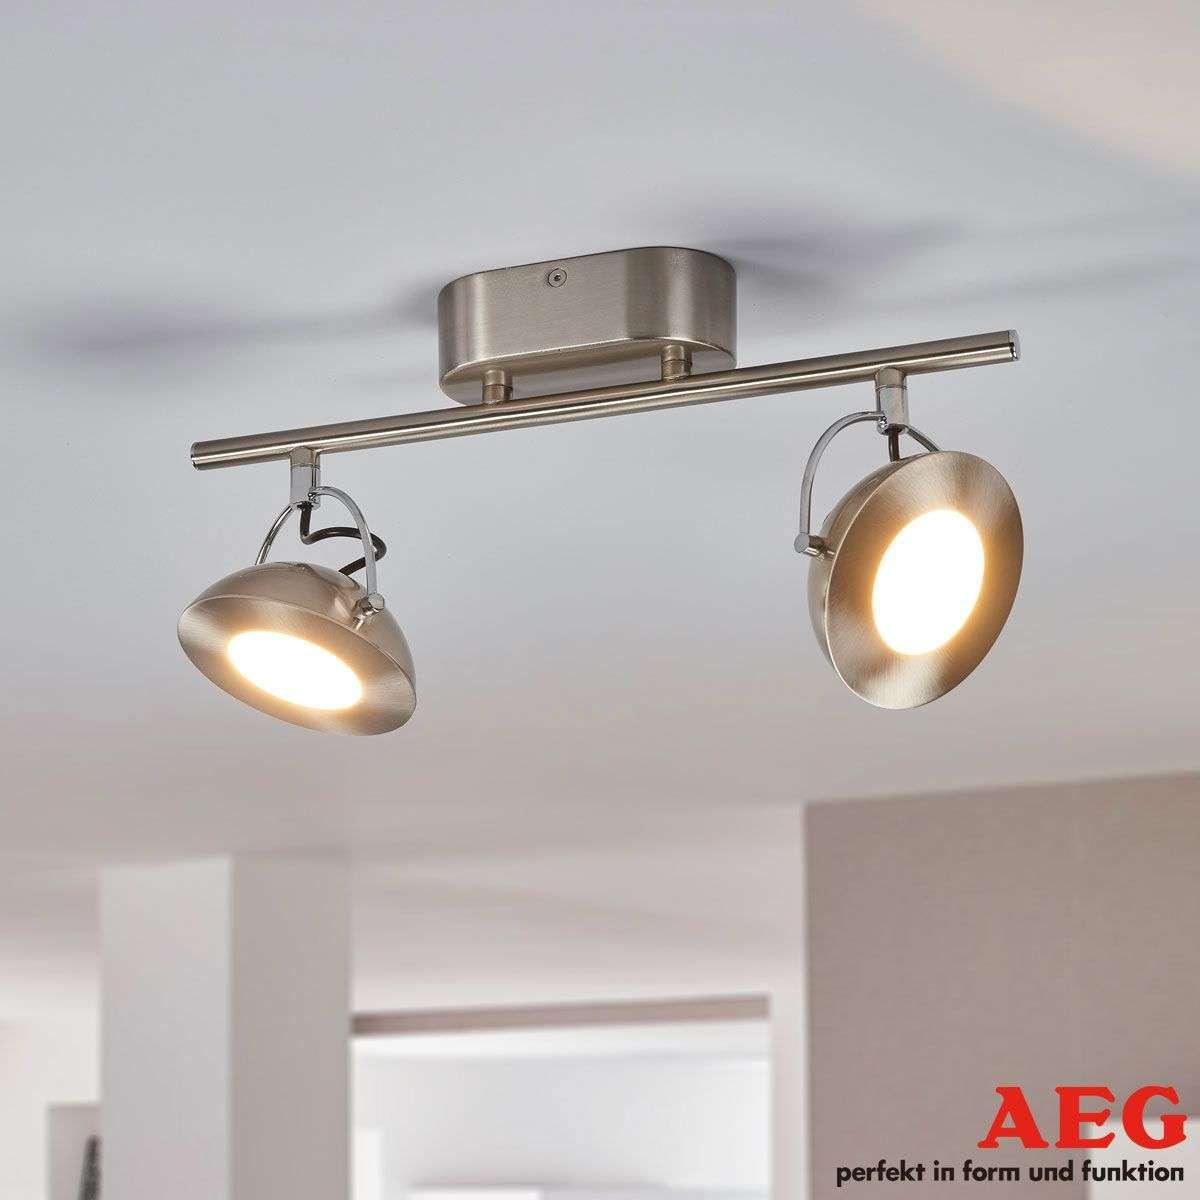 Two bulb letora indirect led ceiling light lights two bulb letora indirect led ceiling light 3057095 31 aloadofball Images